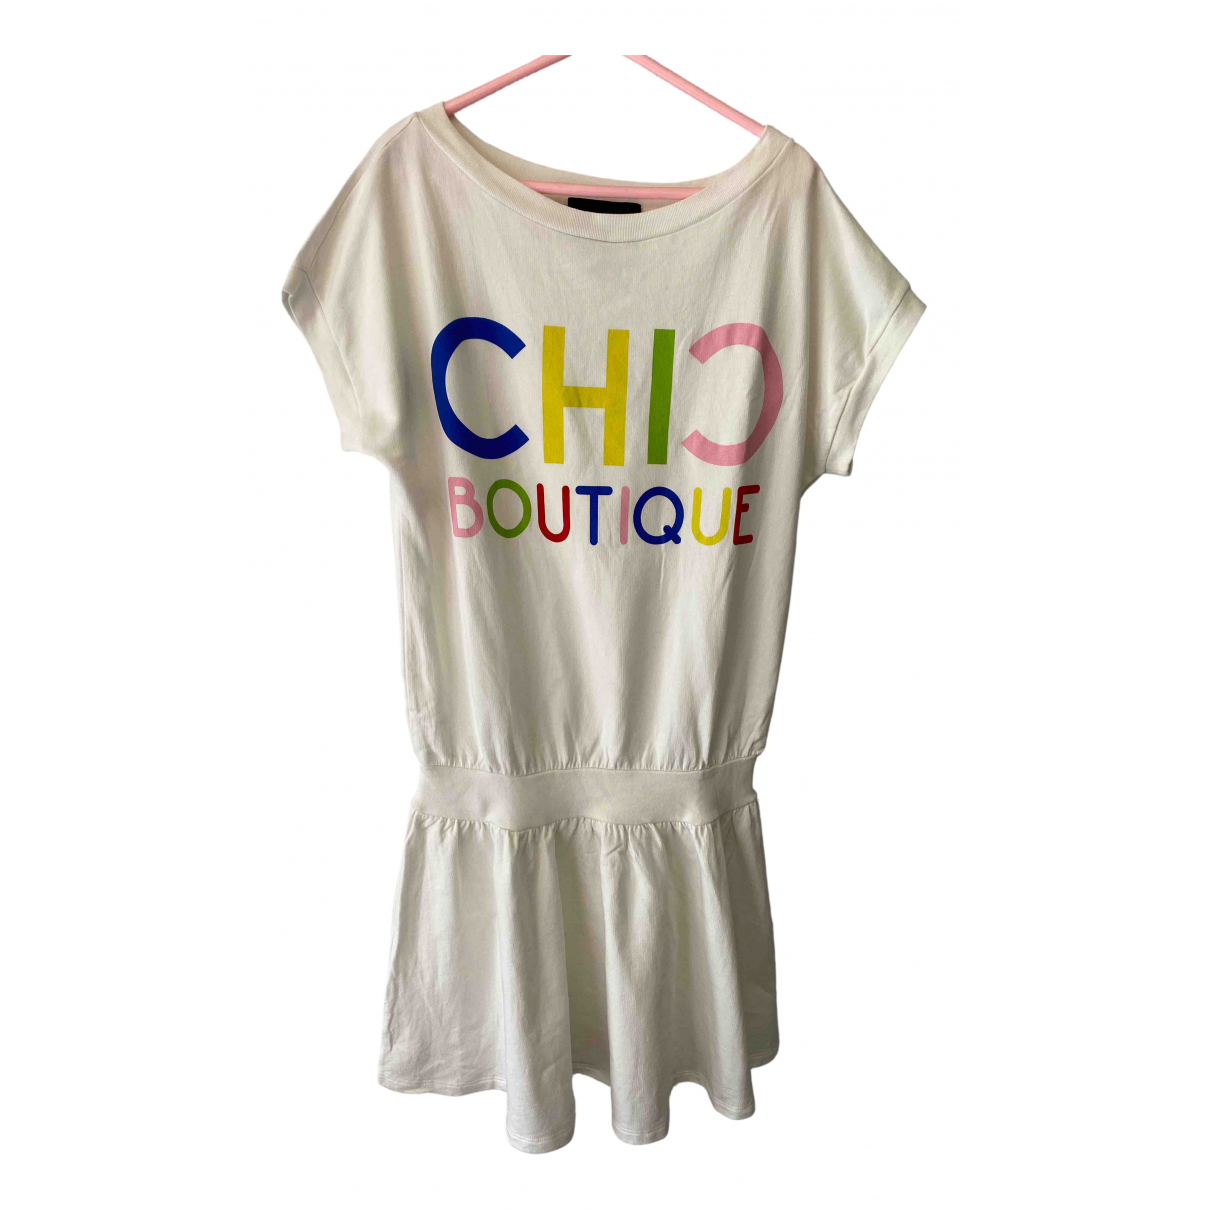 Moschino \N White Cotton dress for Women 36 FR